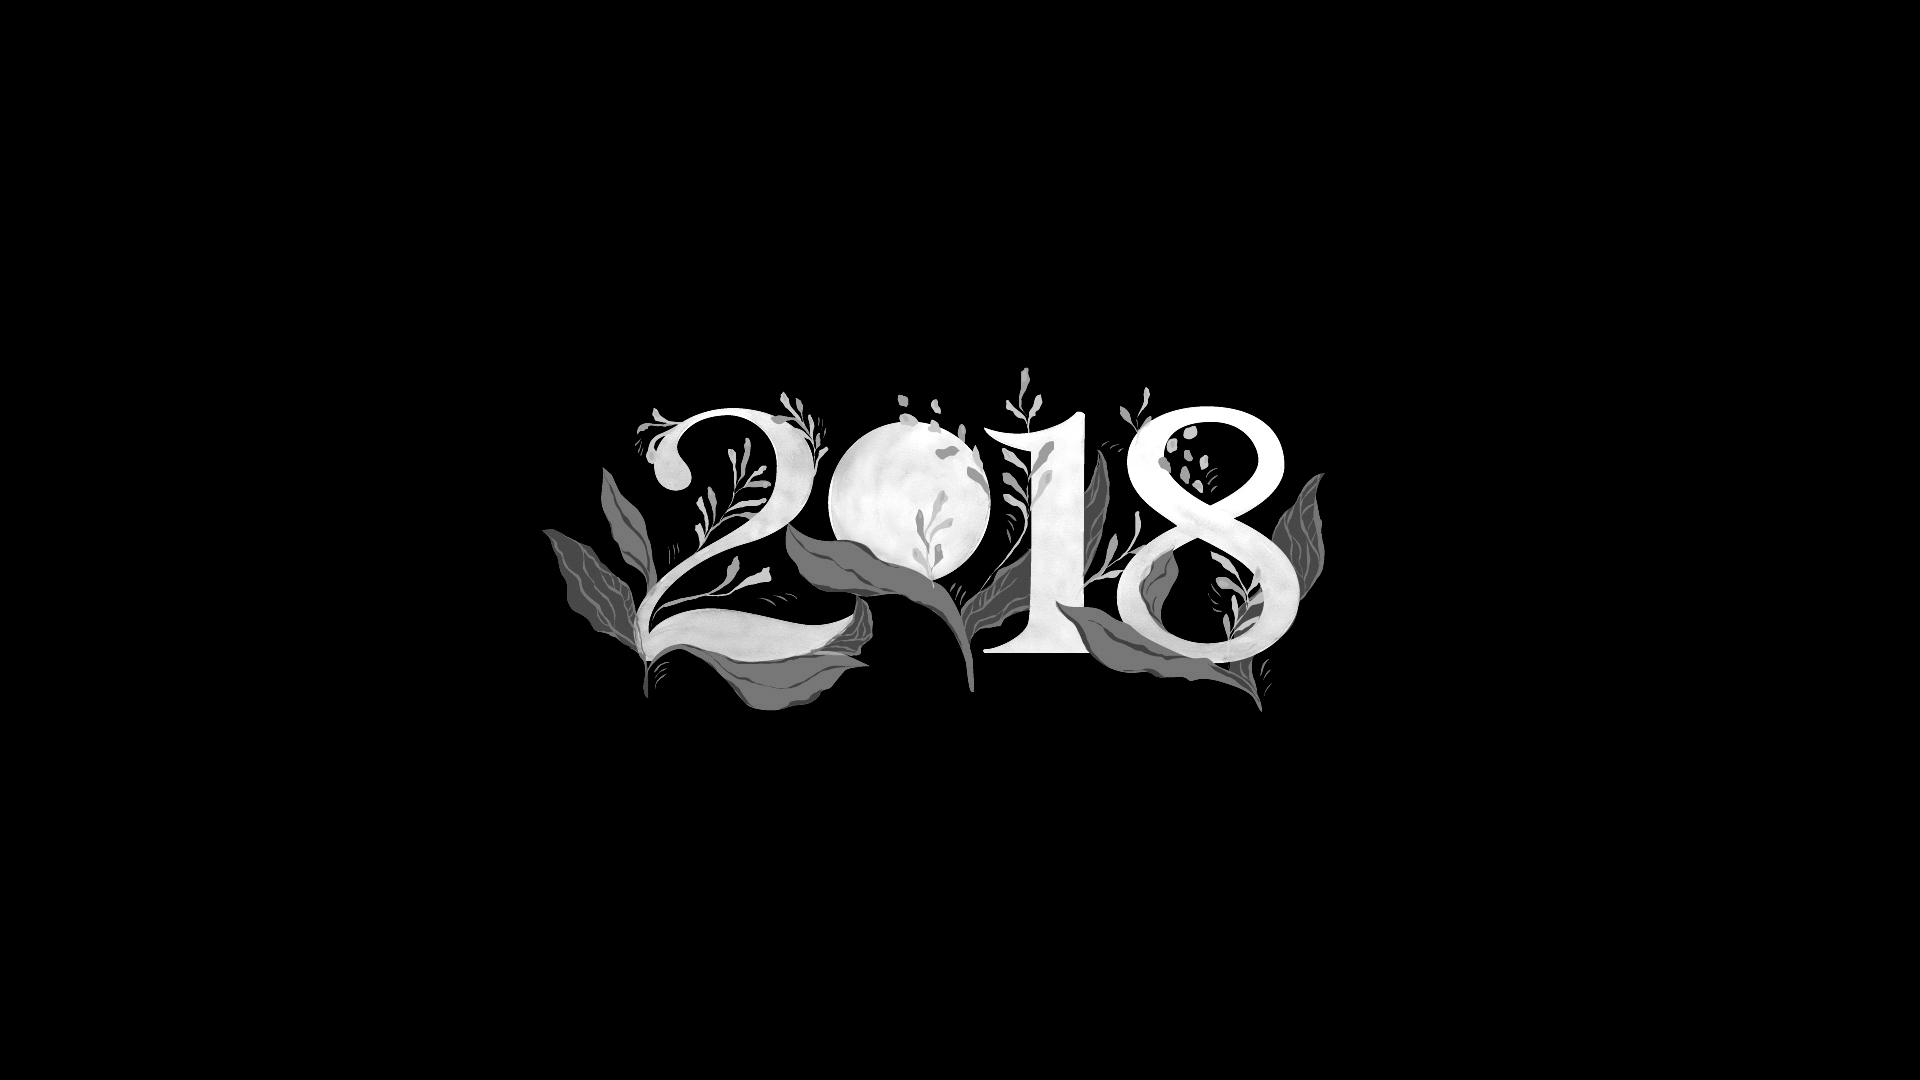 2018-wallpaper-bnw